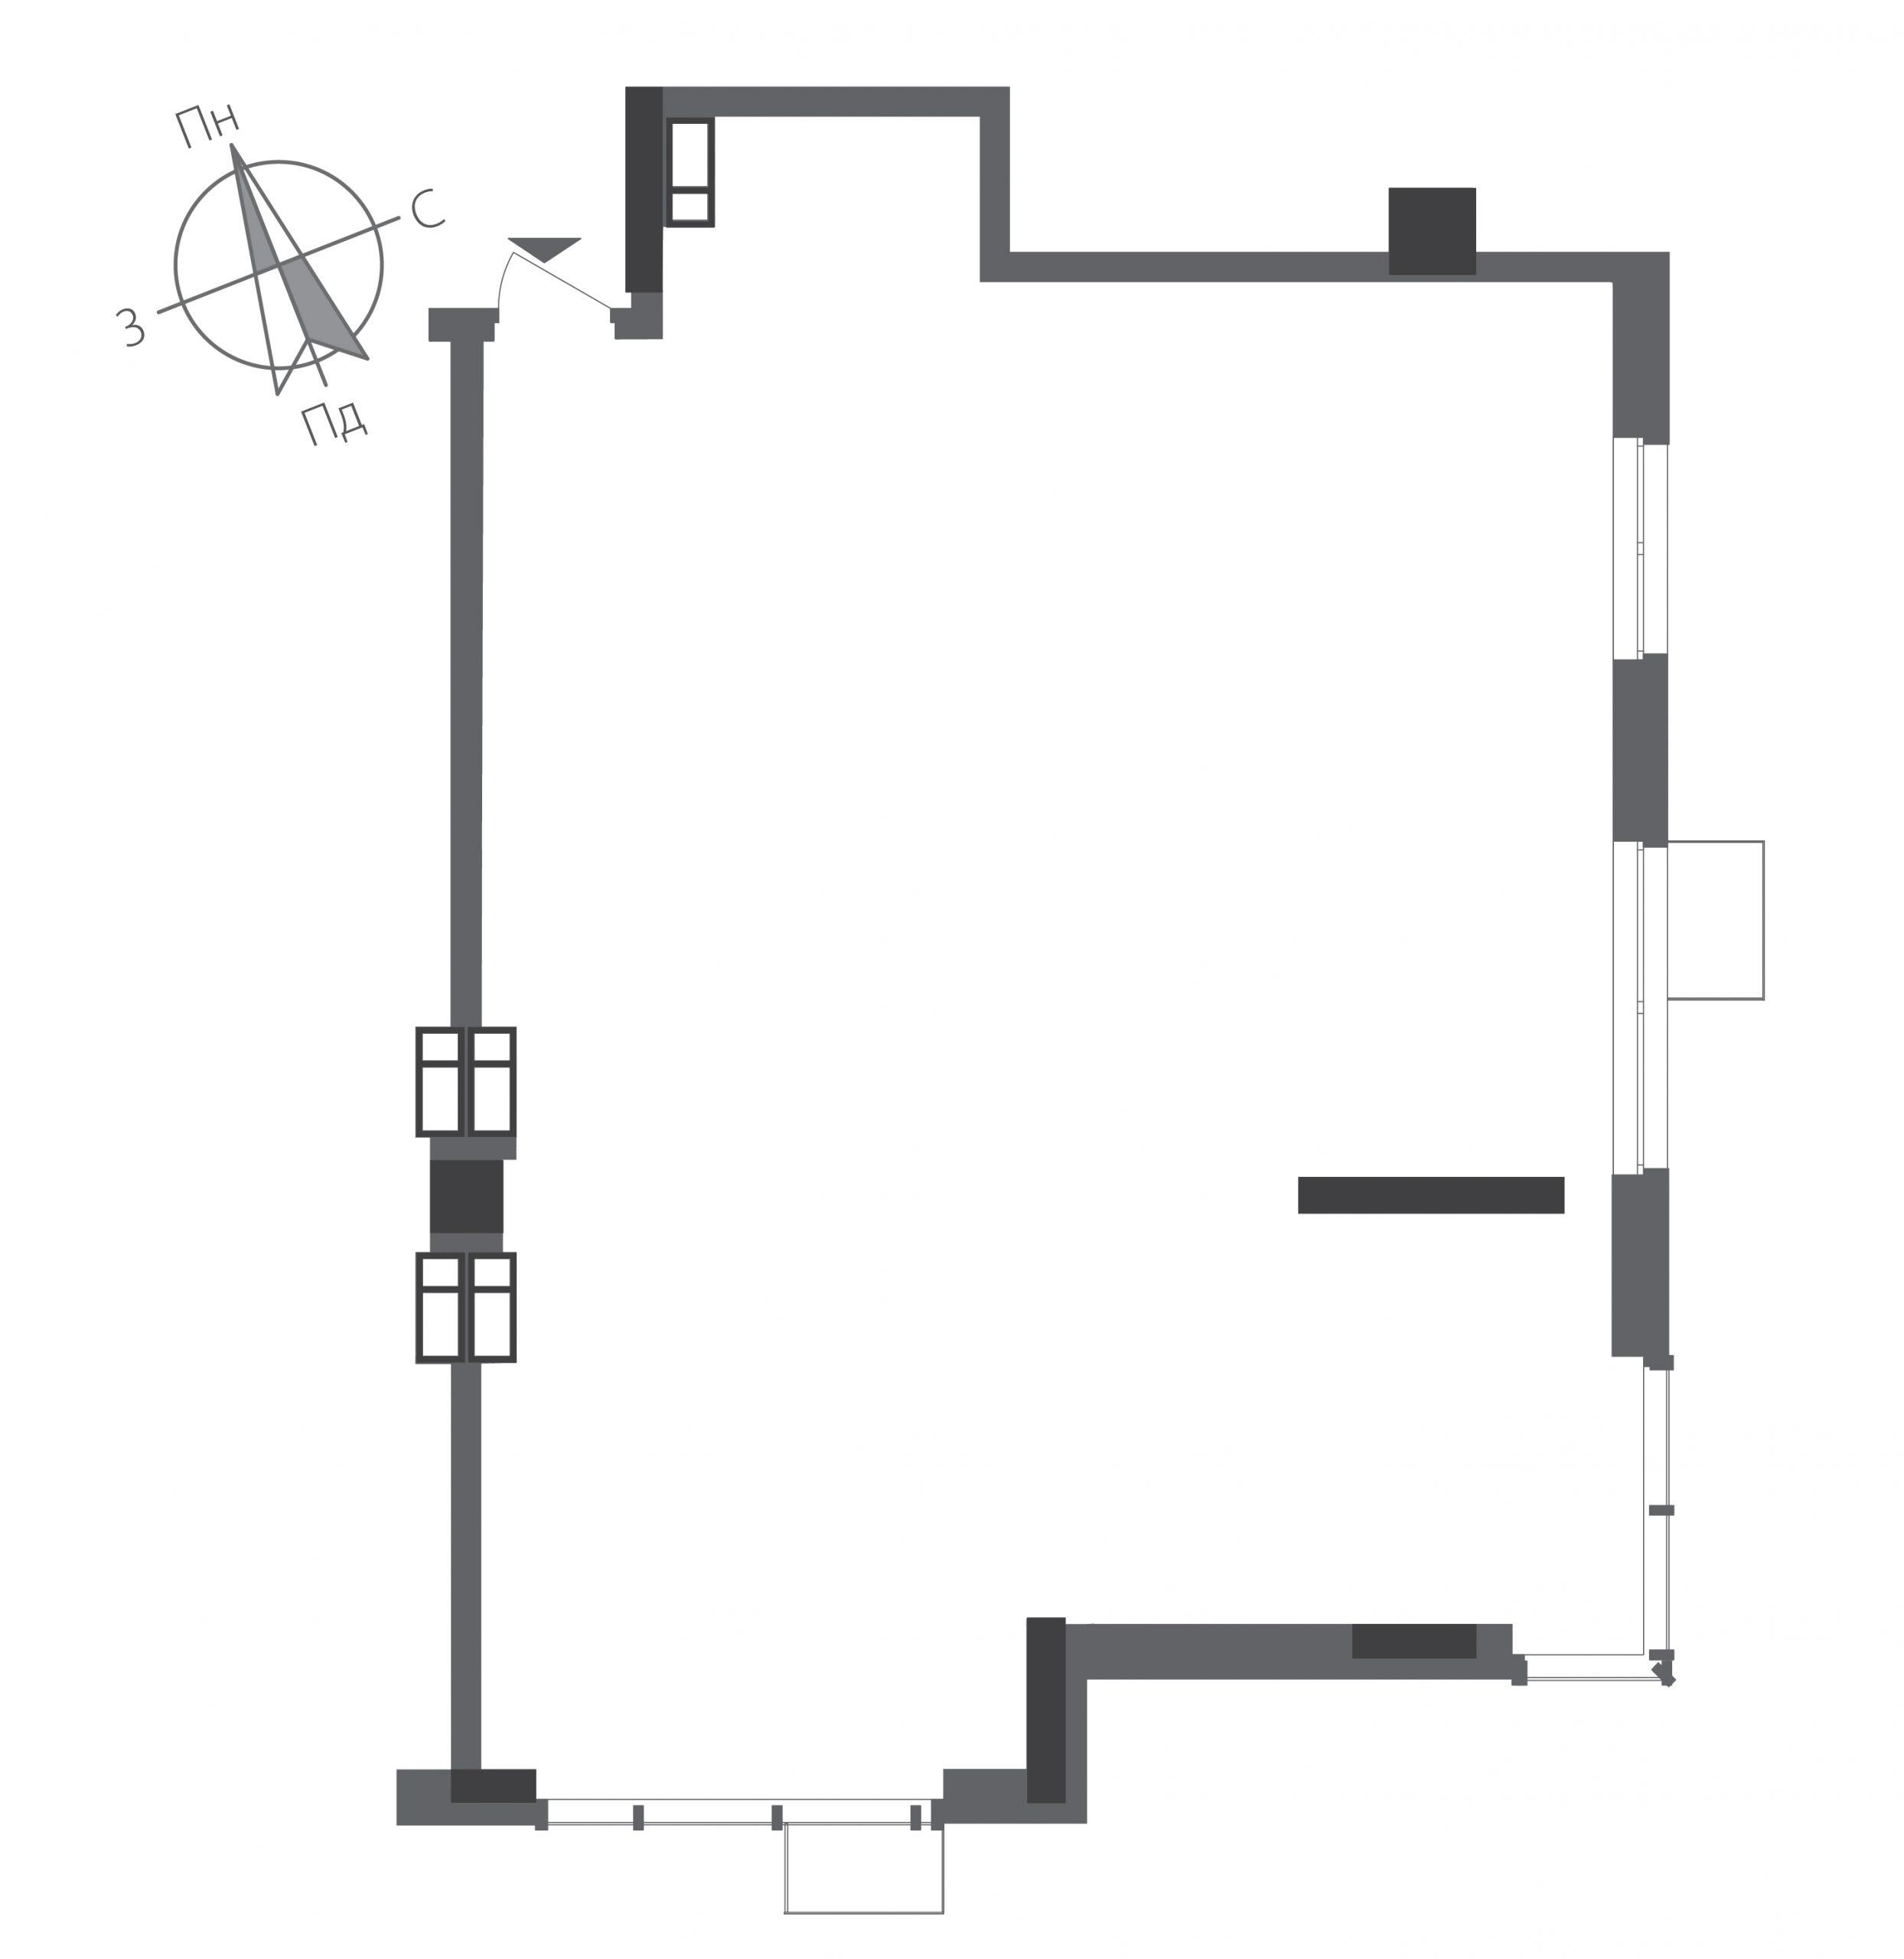 Трикімнатна квартира в ЖК RiverStone Номер квартири №19, Будинок 9, Поверх 19, Повна площа 108,42